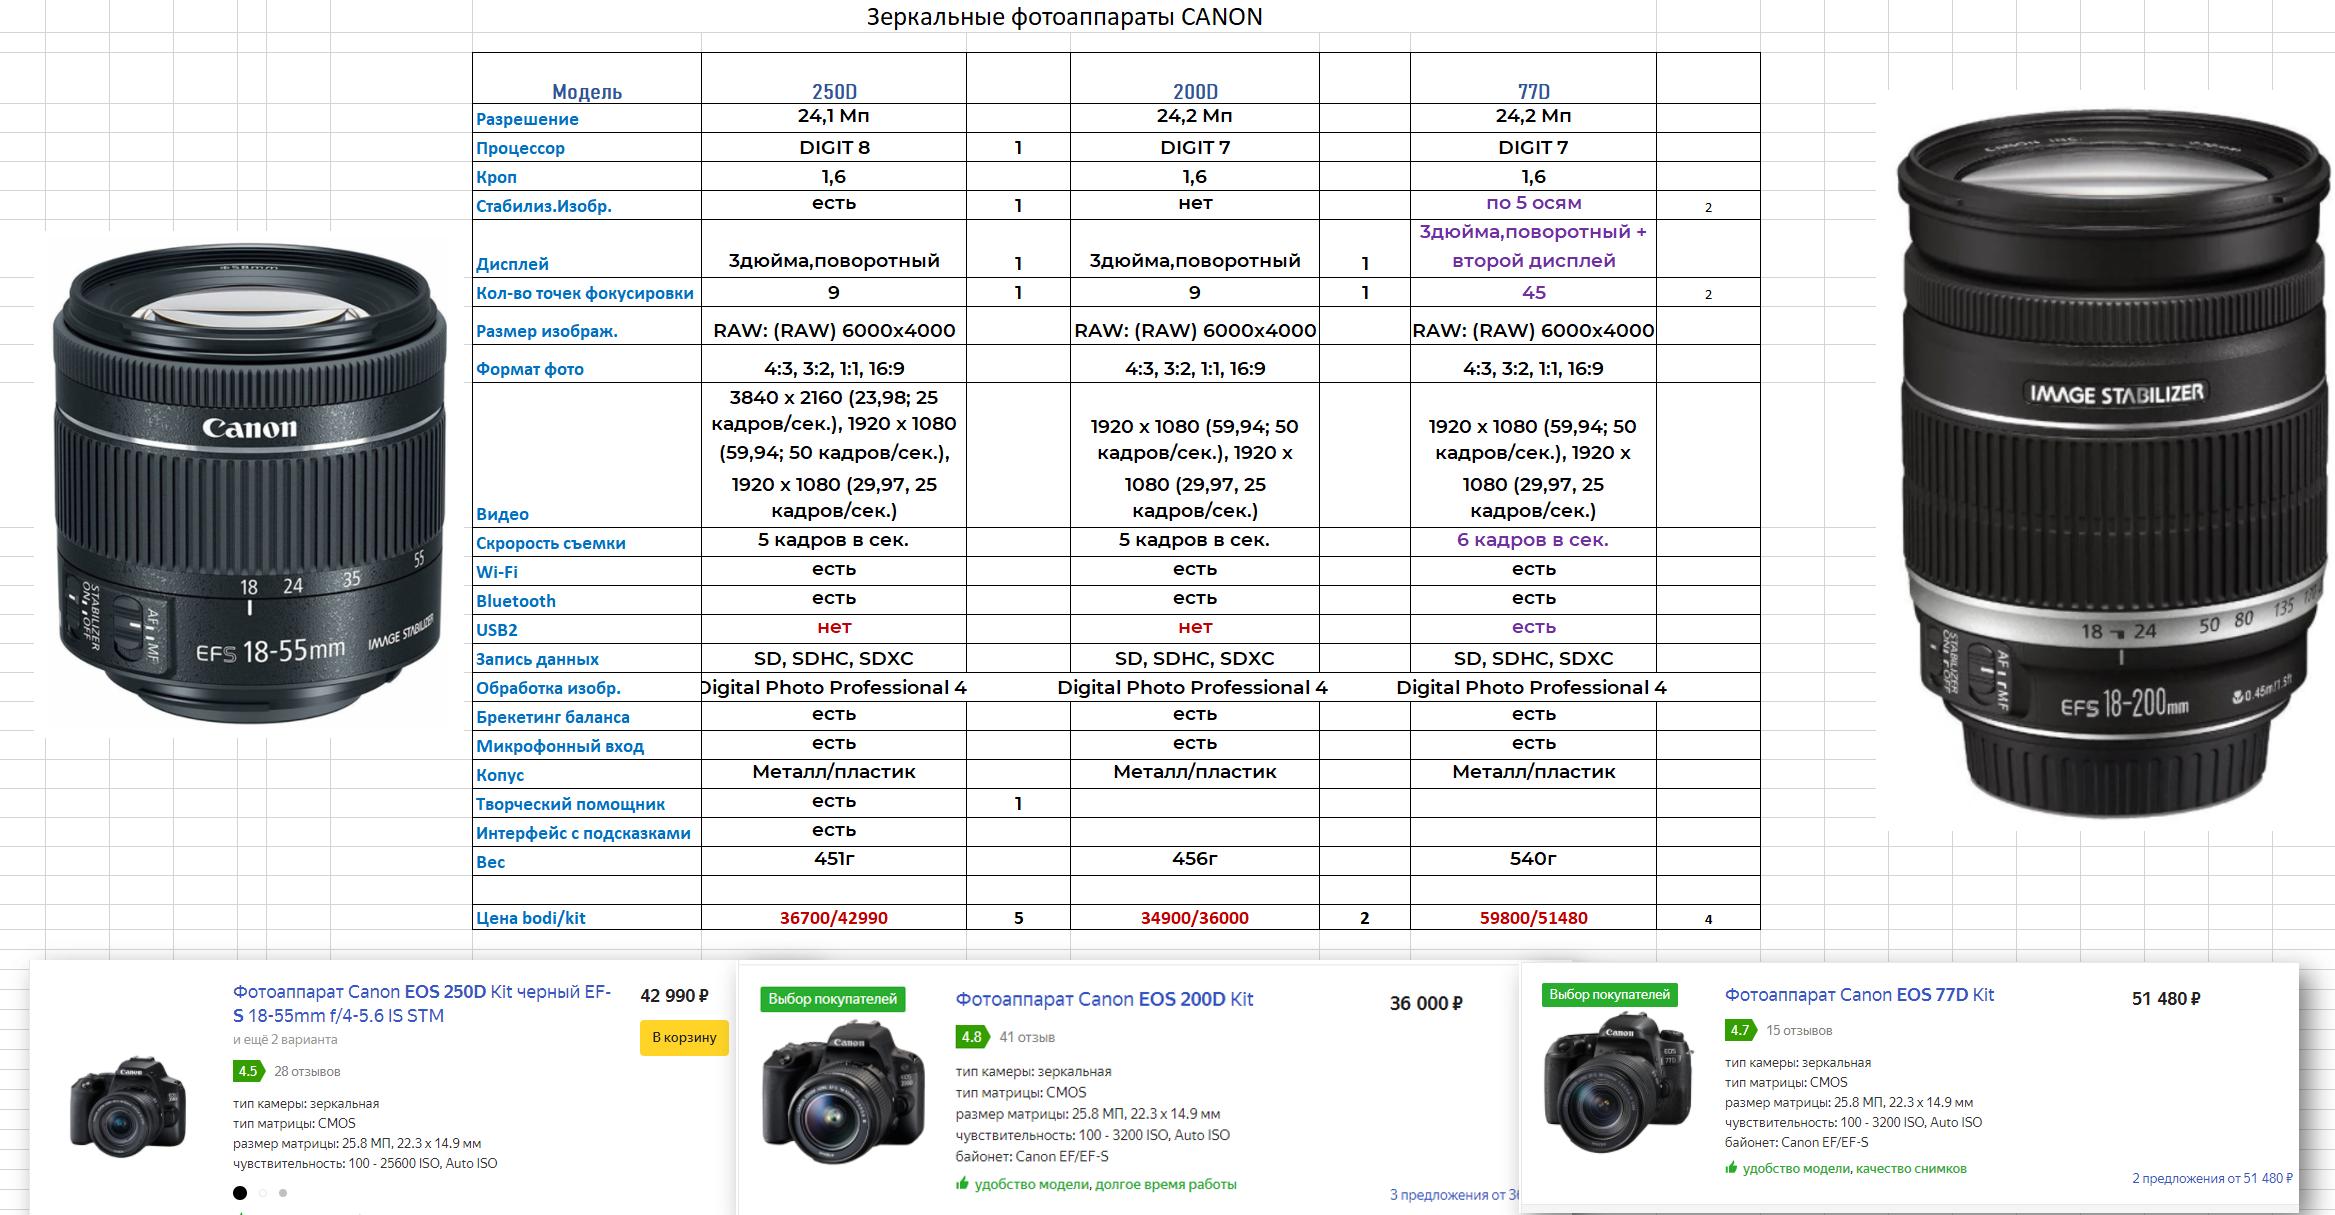 Параметры фотоаппаратов Canon